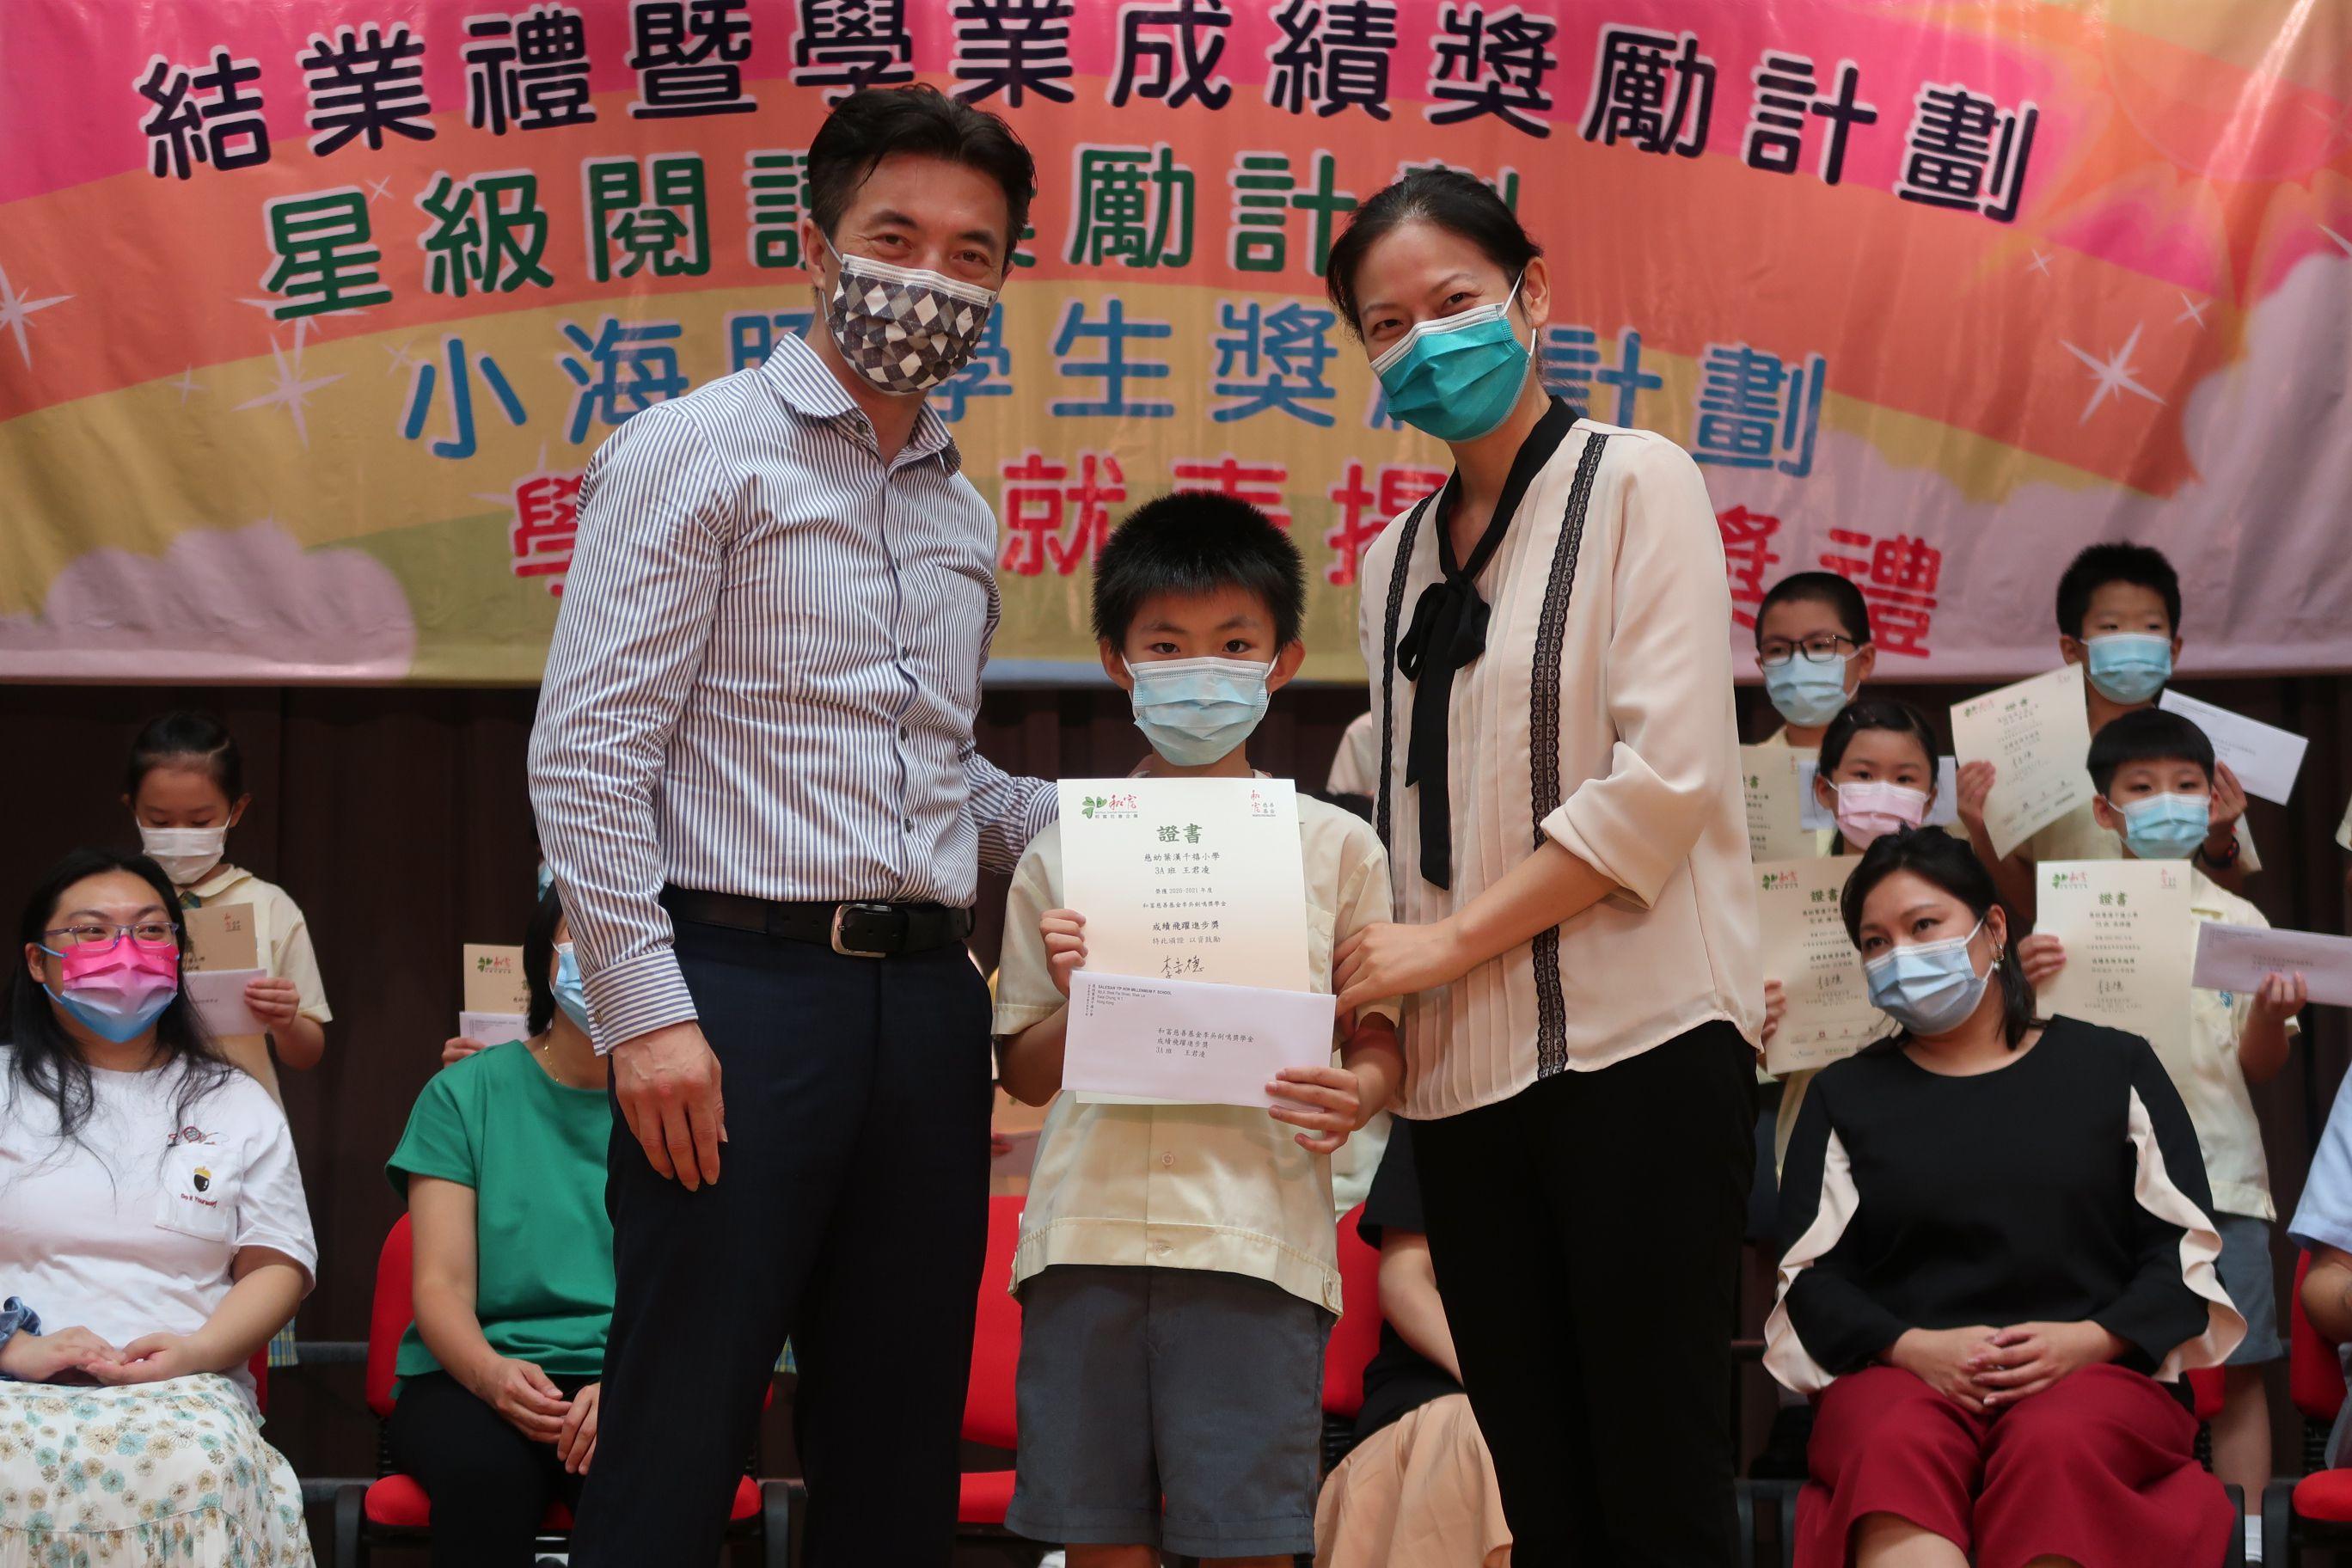 https://syh.edu.hk/sites/default/files/img_5944_1.jpg